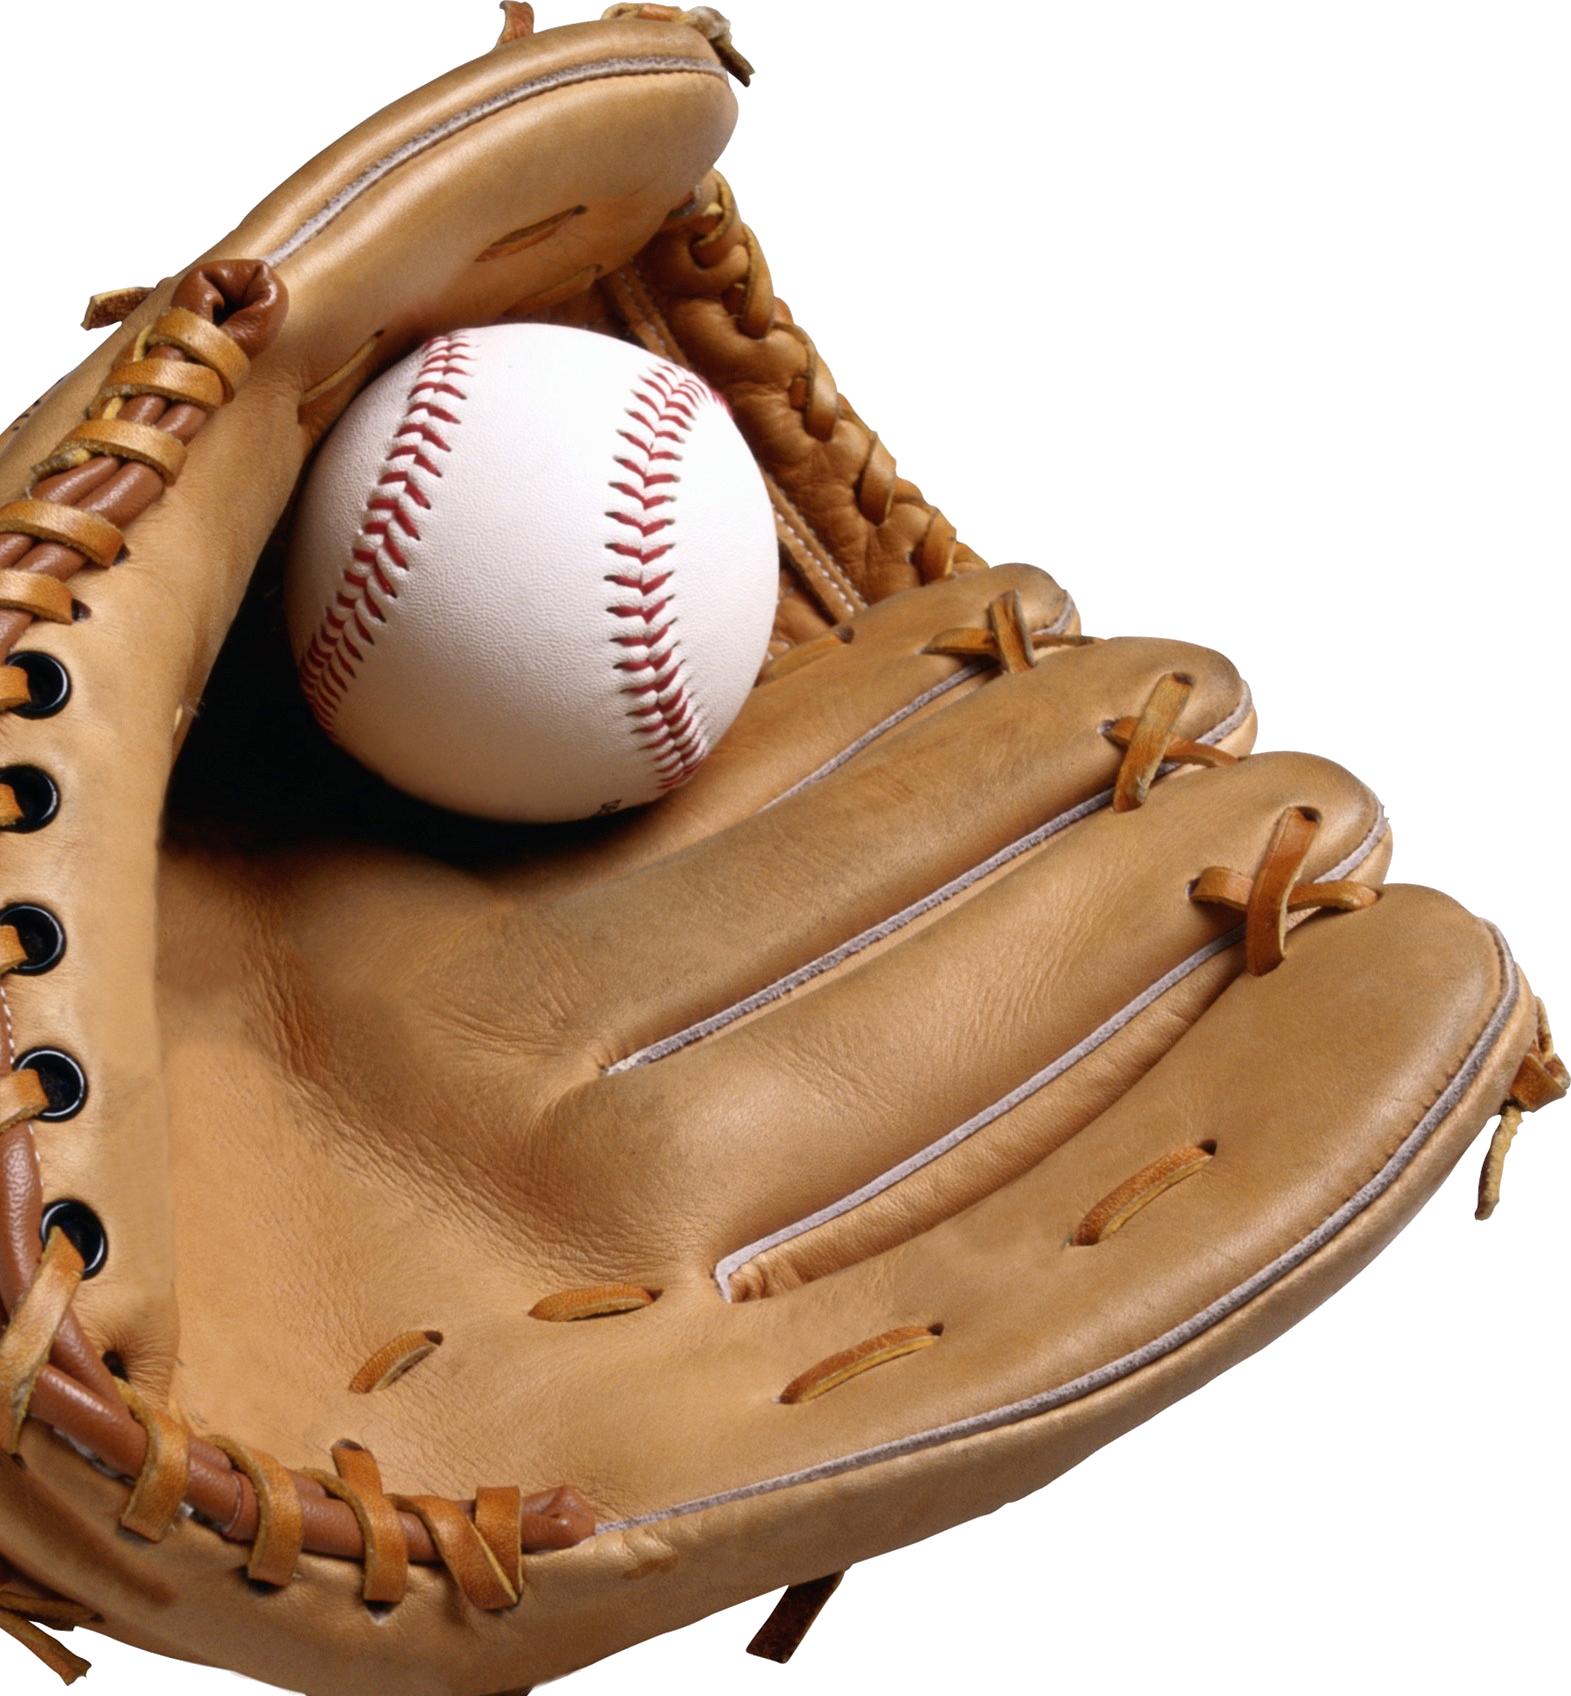 Gloves png image purepng. Glove clipart baseball